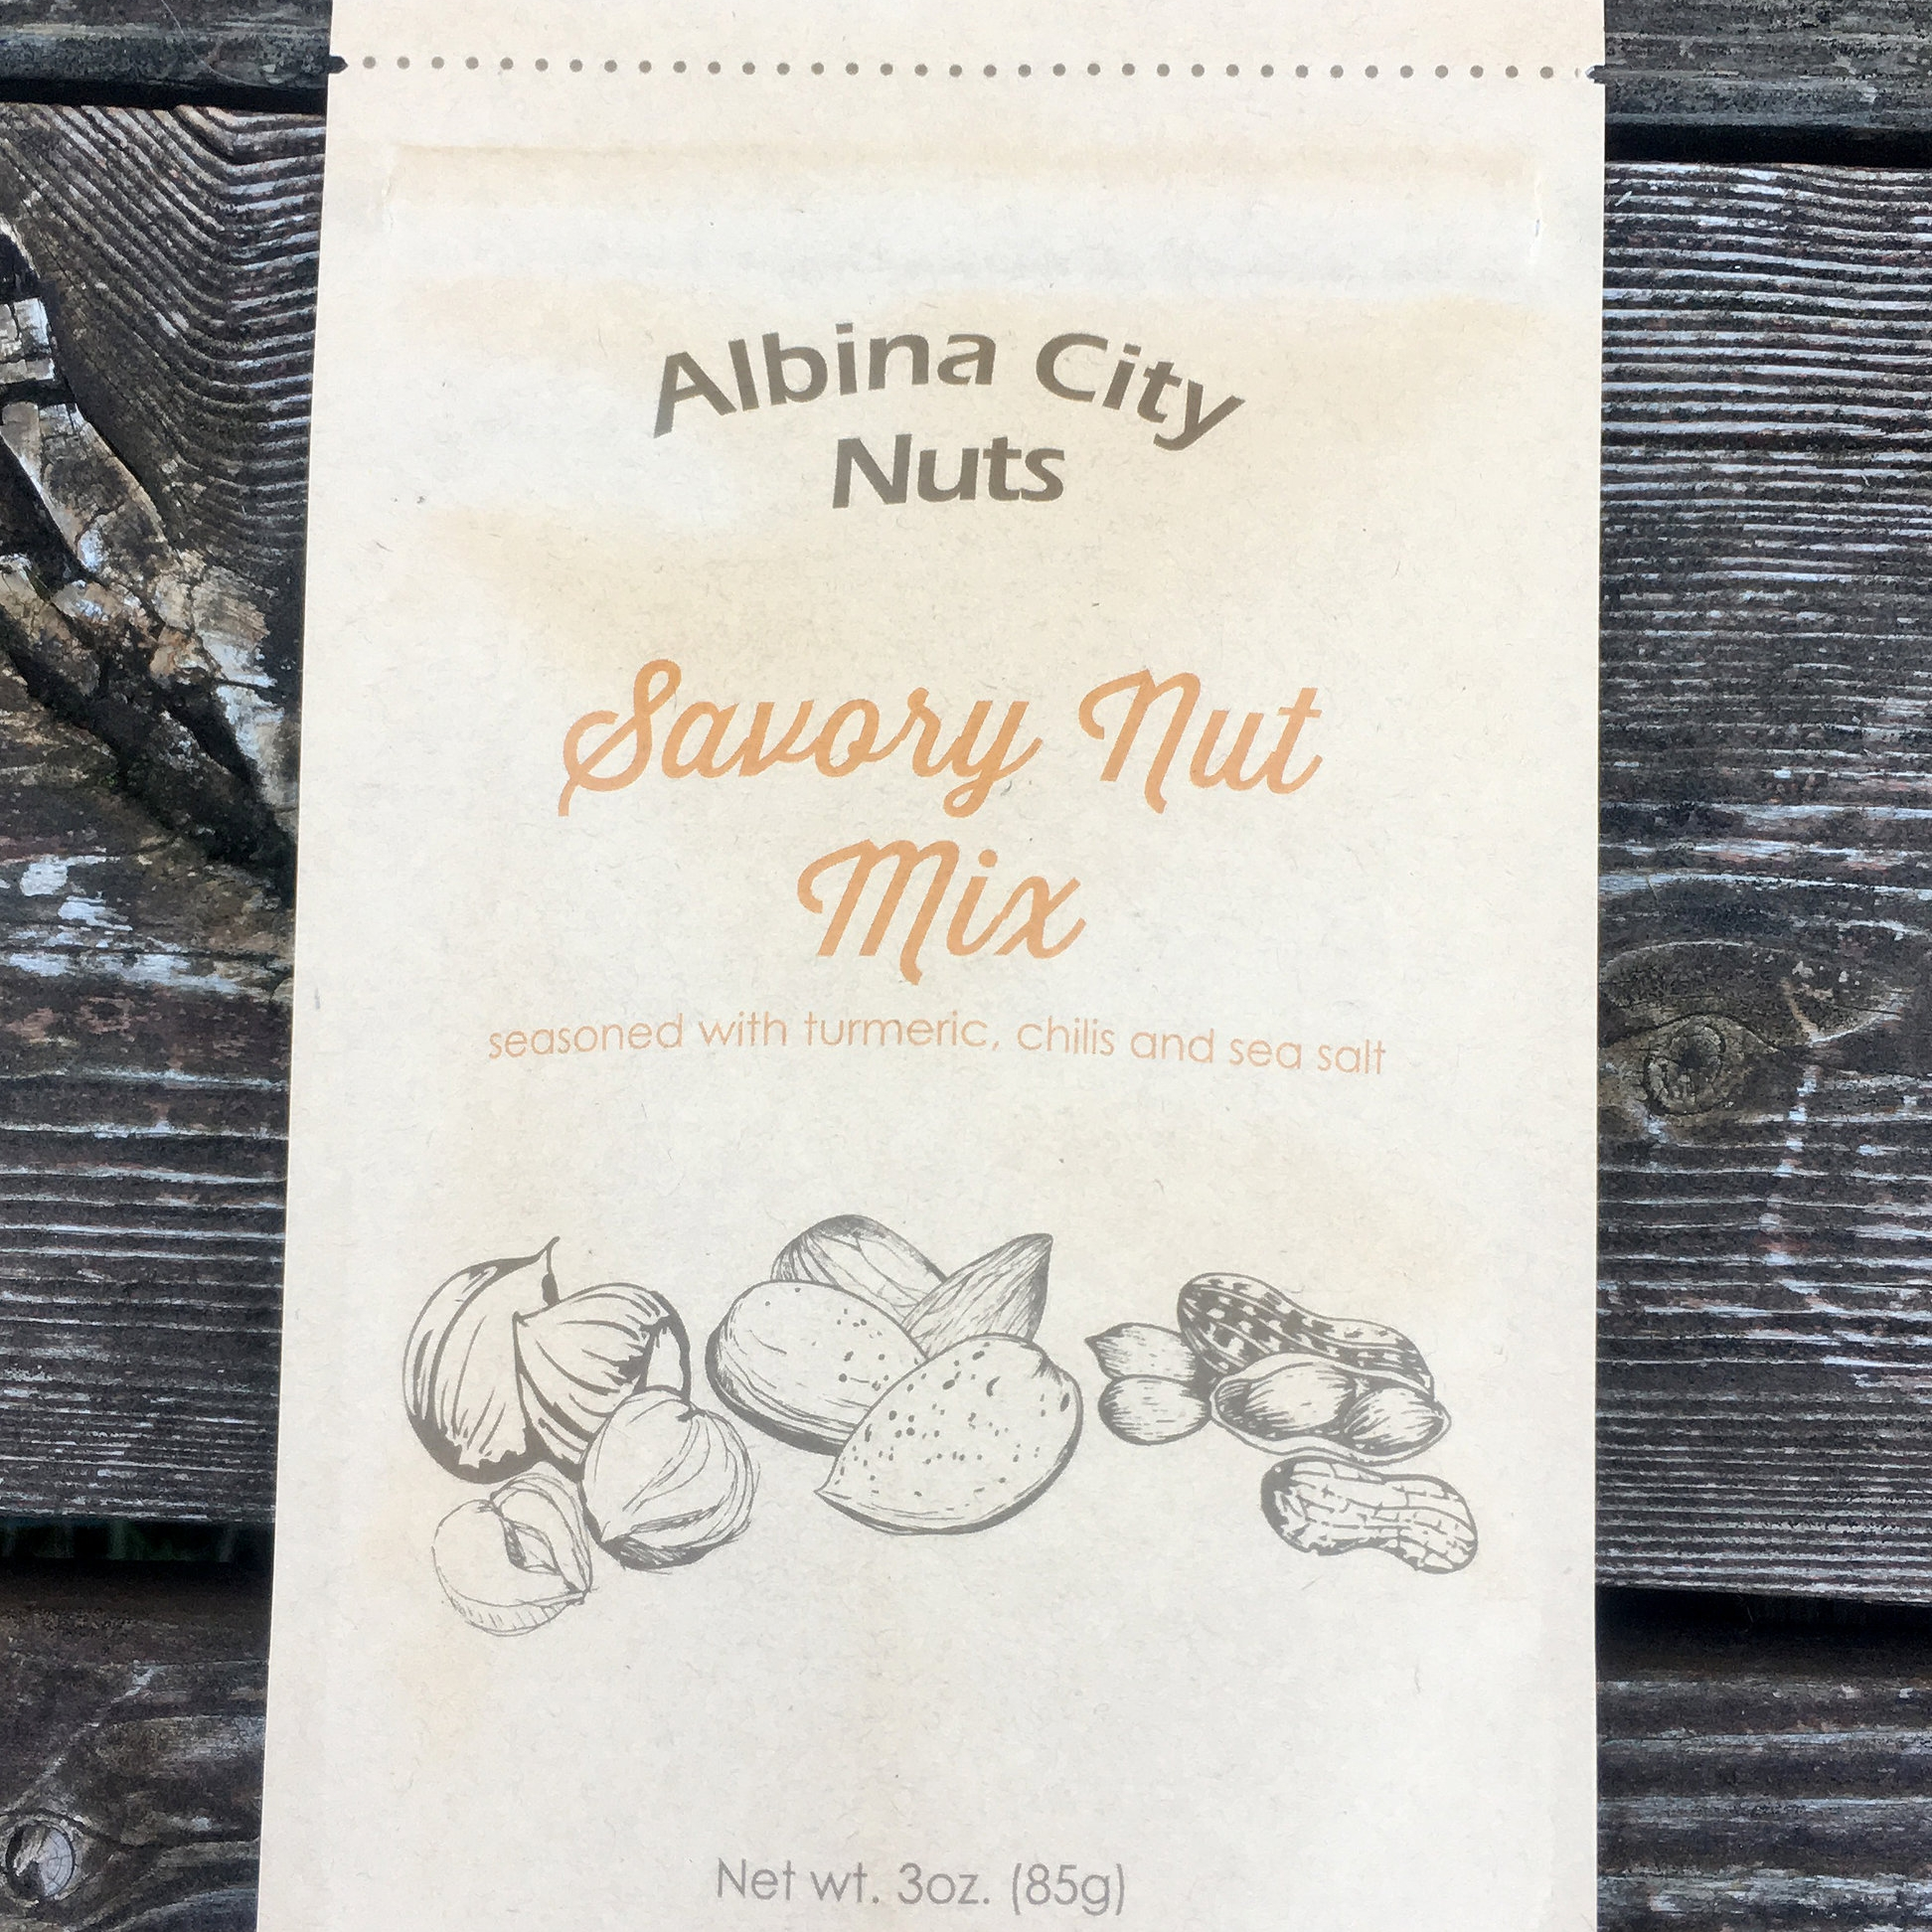 Albina City Nuts, Portland